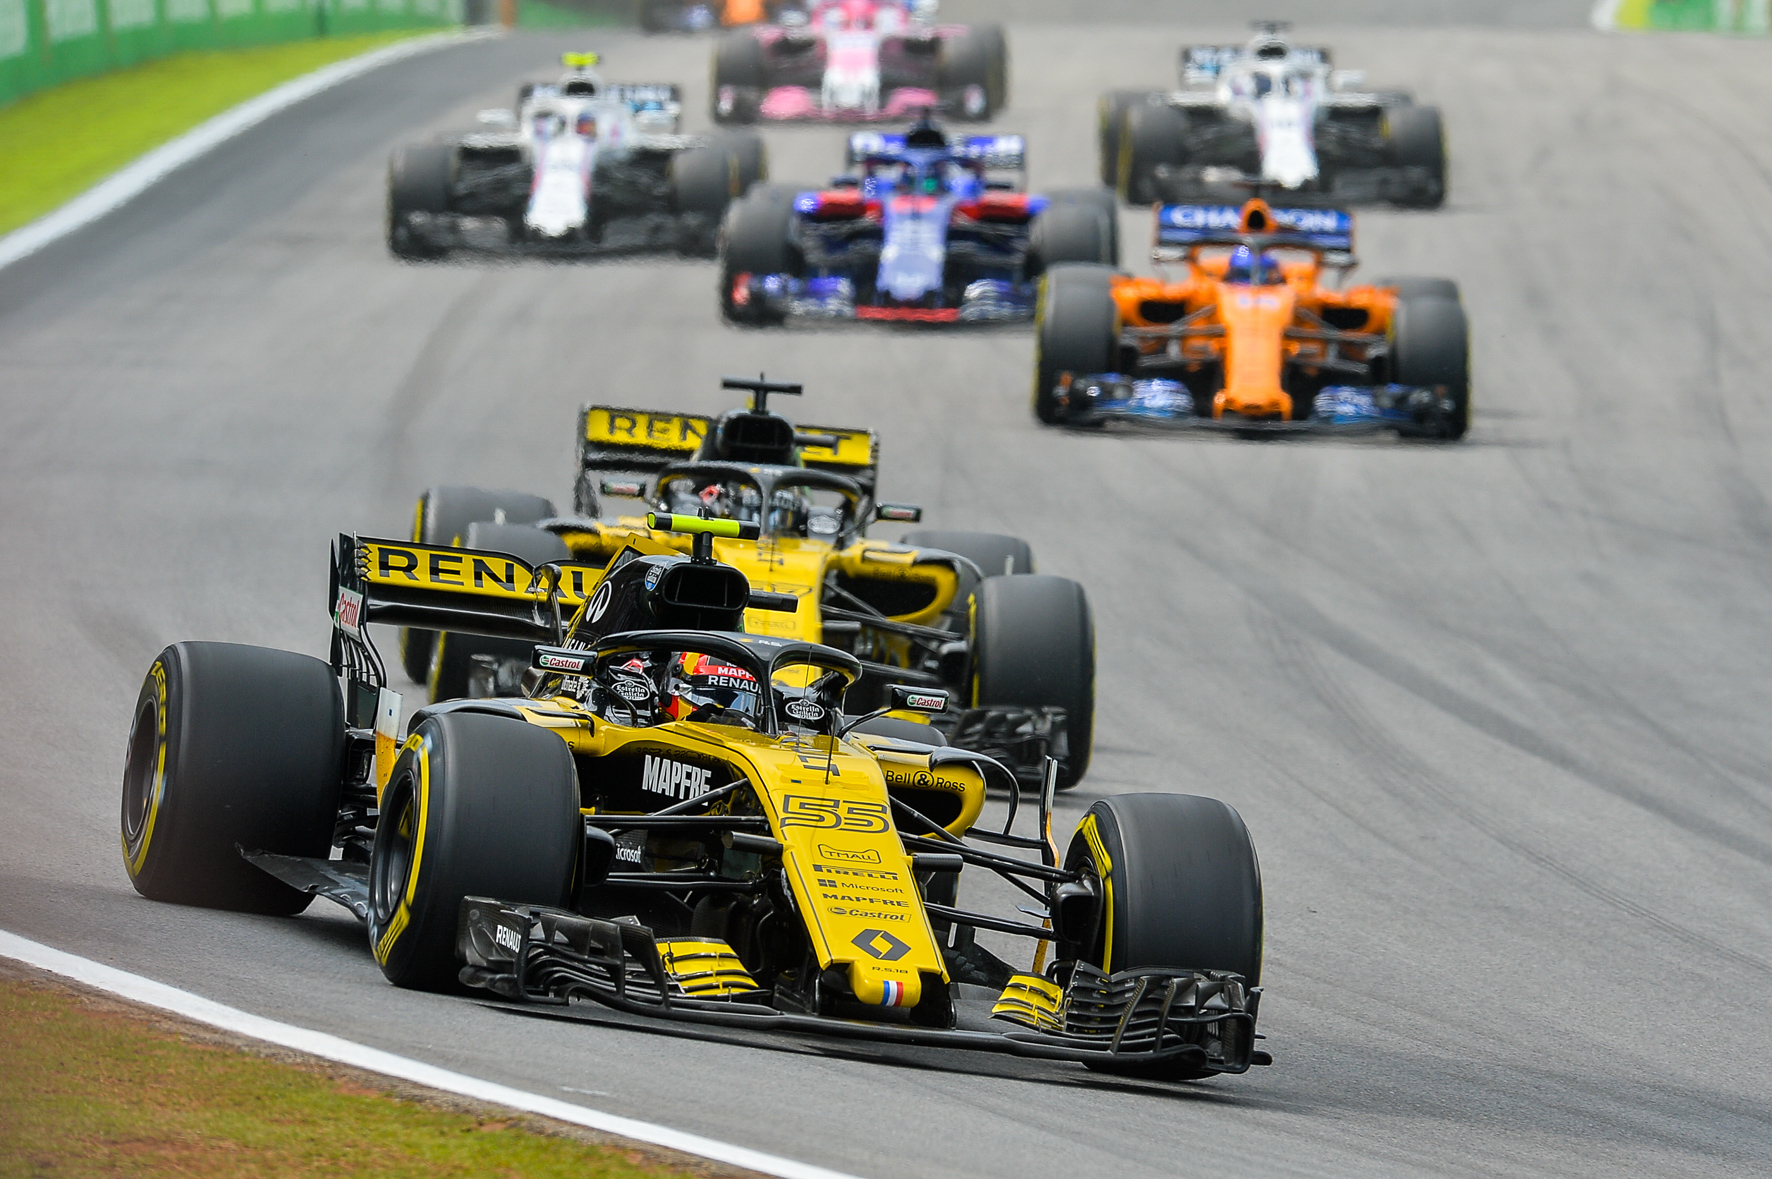 GPBrasil2018_dudabairros_Renault-44951